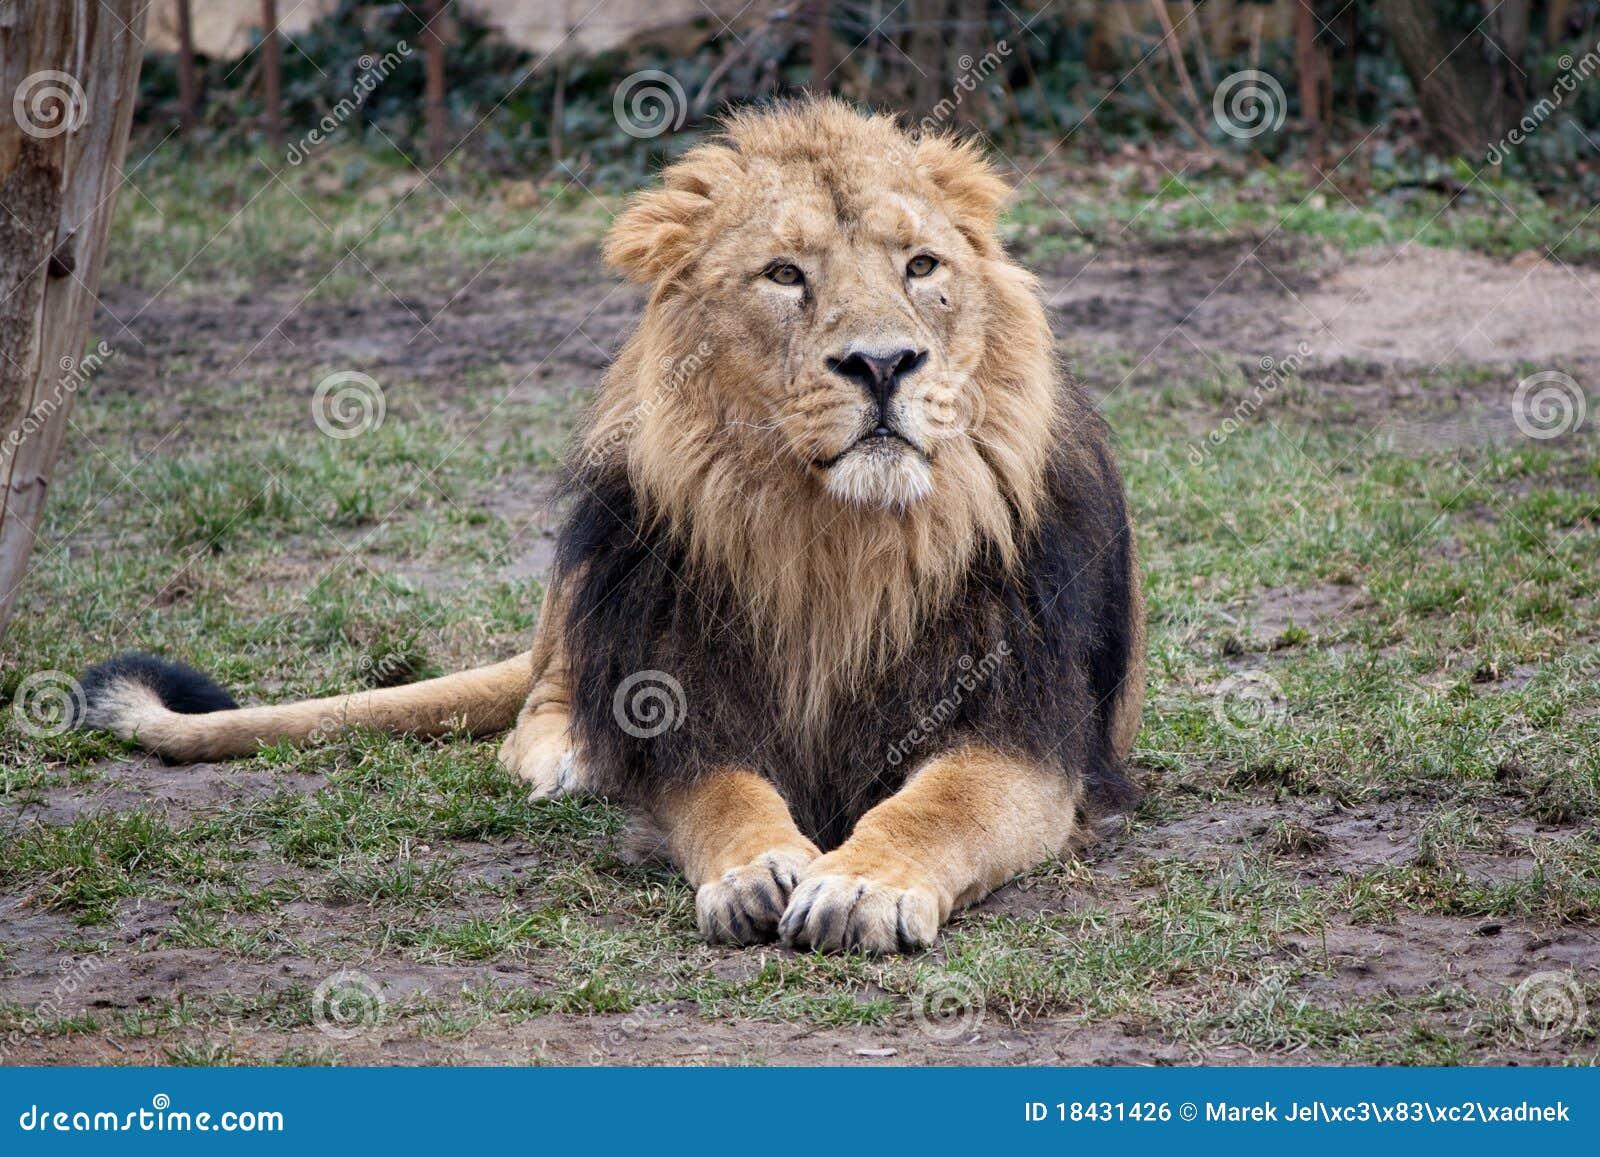 Lion sitting - photo#25